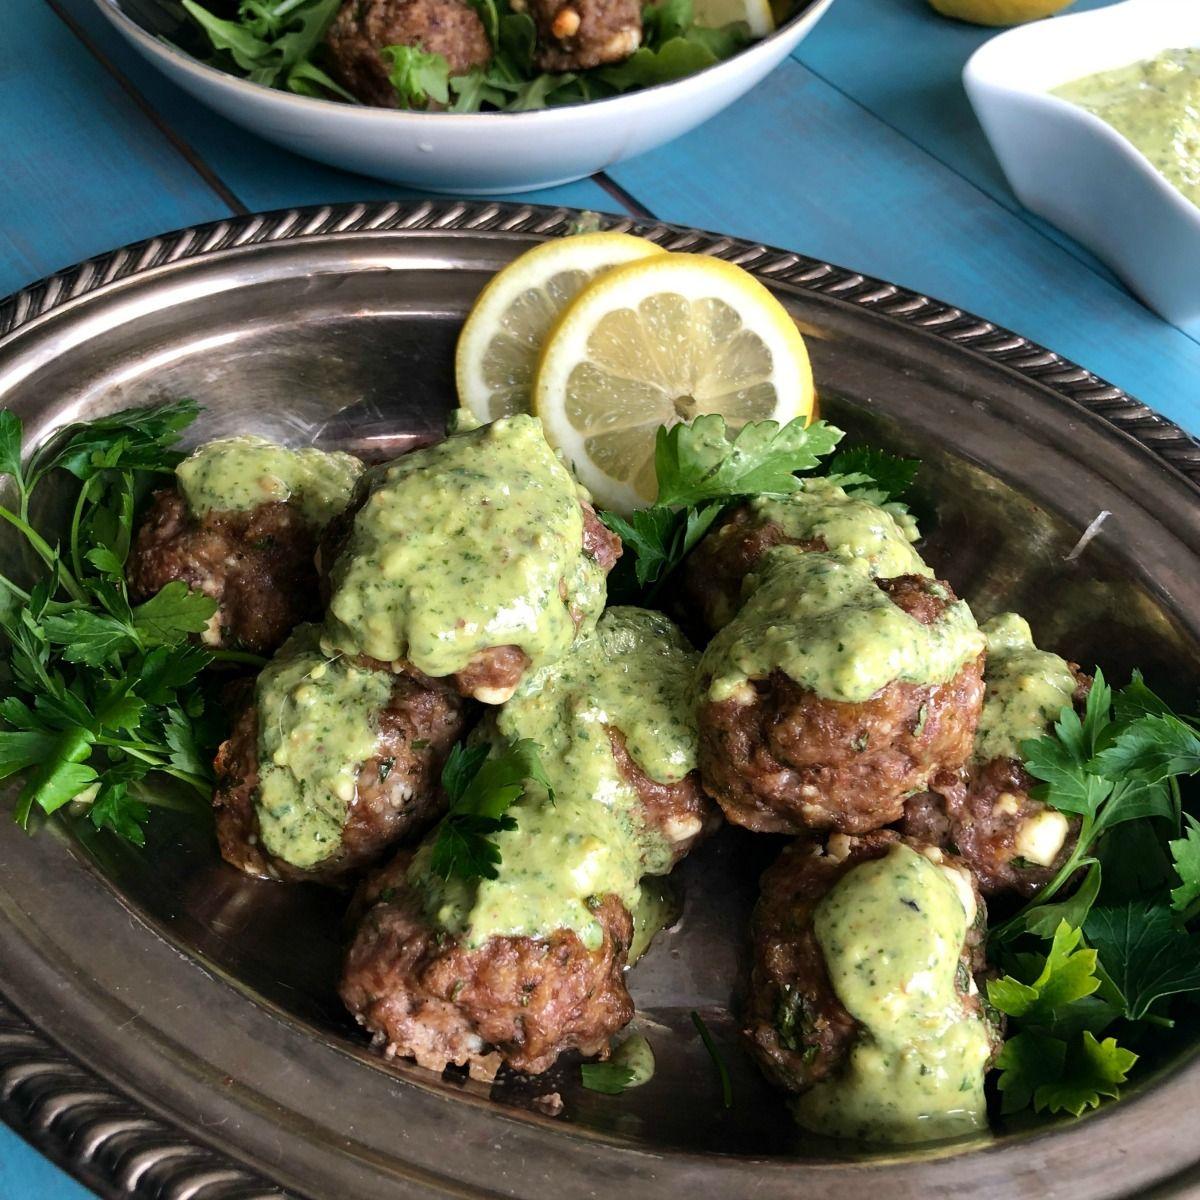 Greek Feta Lamb Meatballs With Mint Pesto Keto And Paleo Friendly Recipe Lamb Meatballs Ground Lamb Recipes Mediterranean Diet Recipes